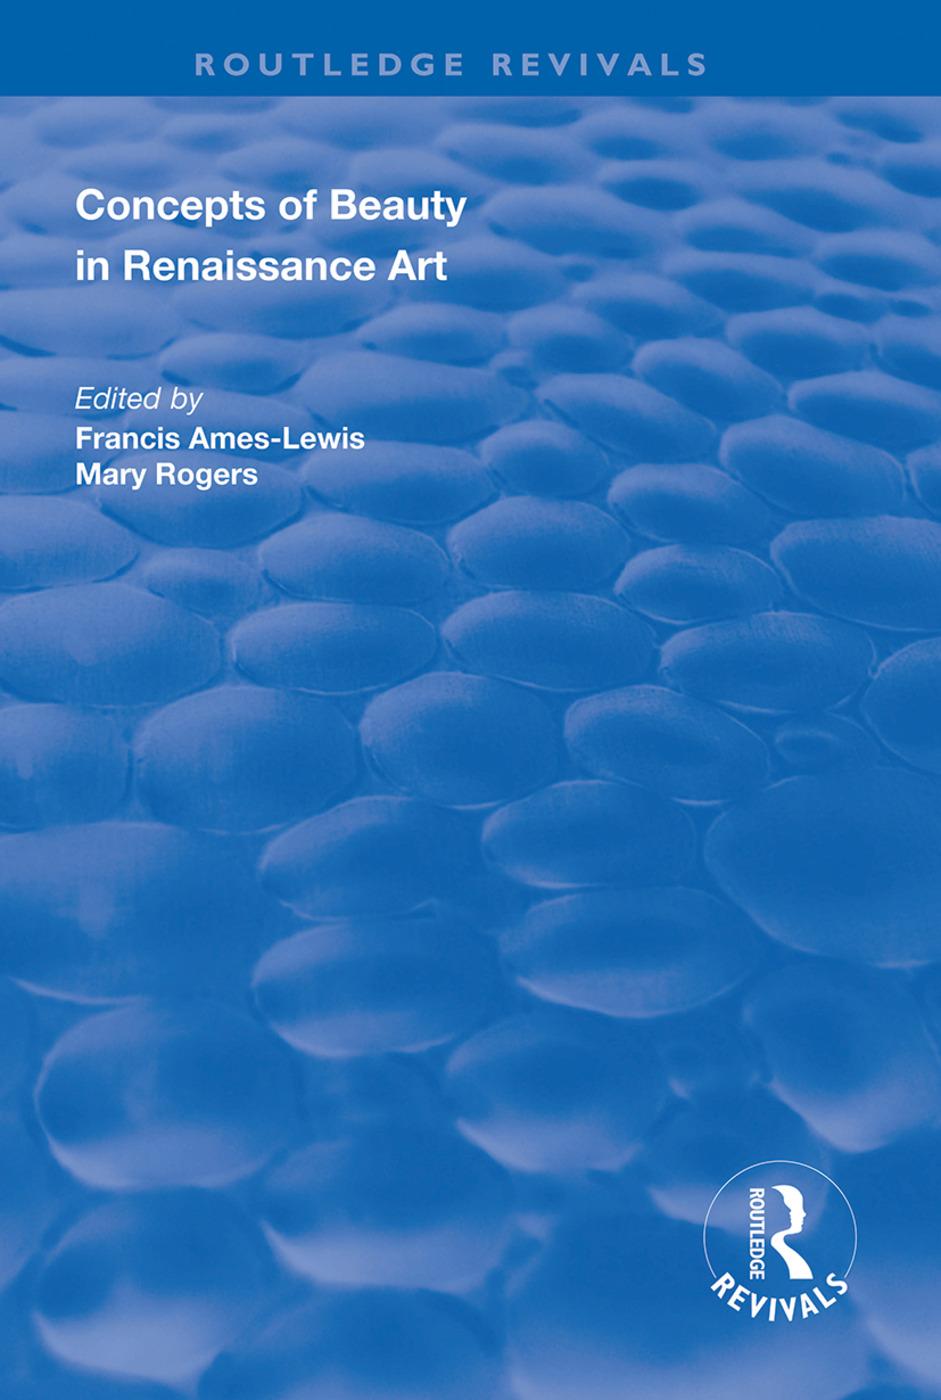 Concepts of Beauty in Renaissance Art